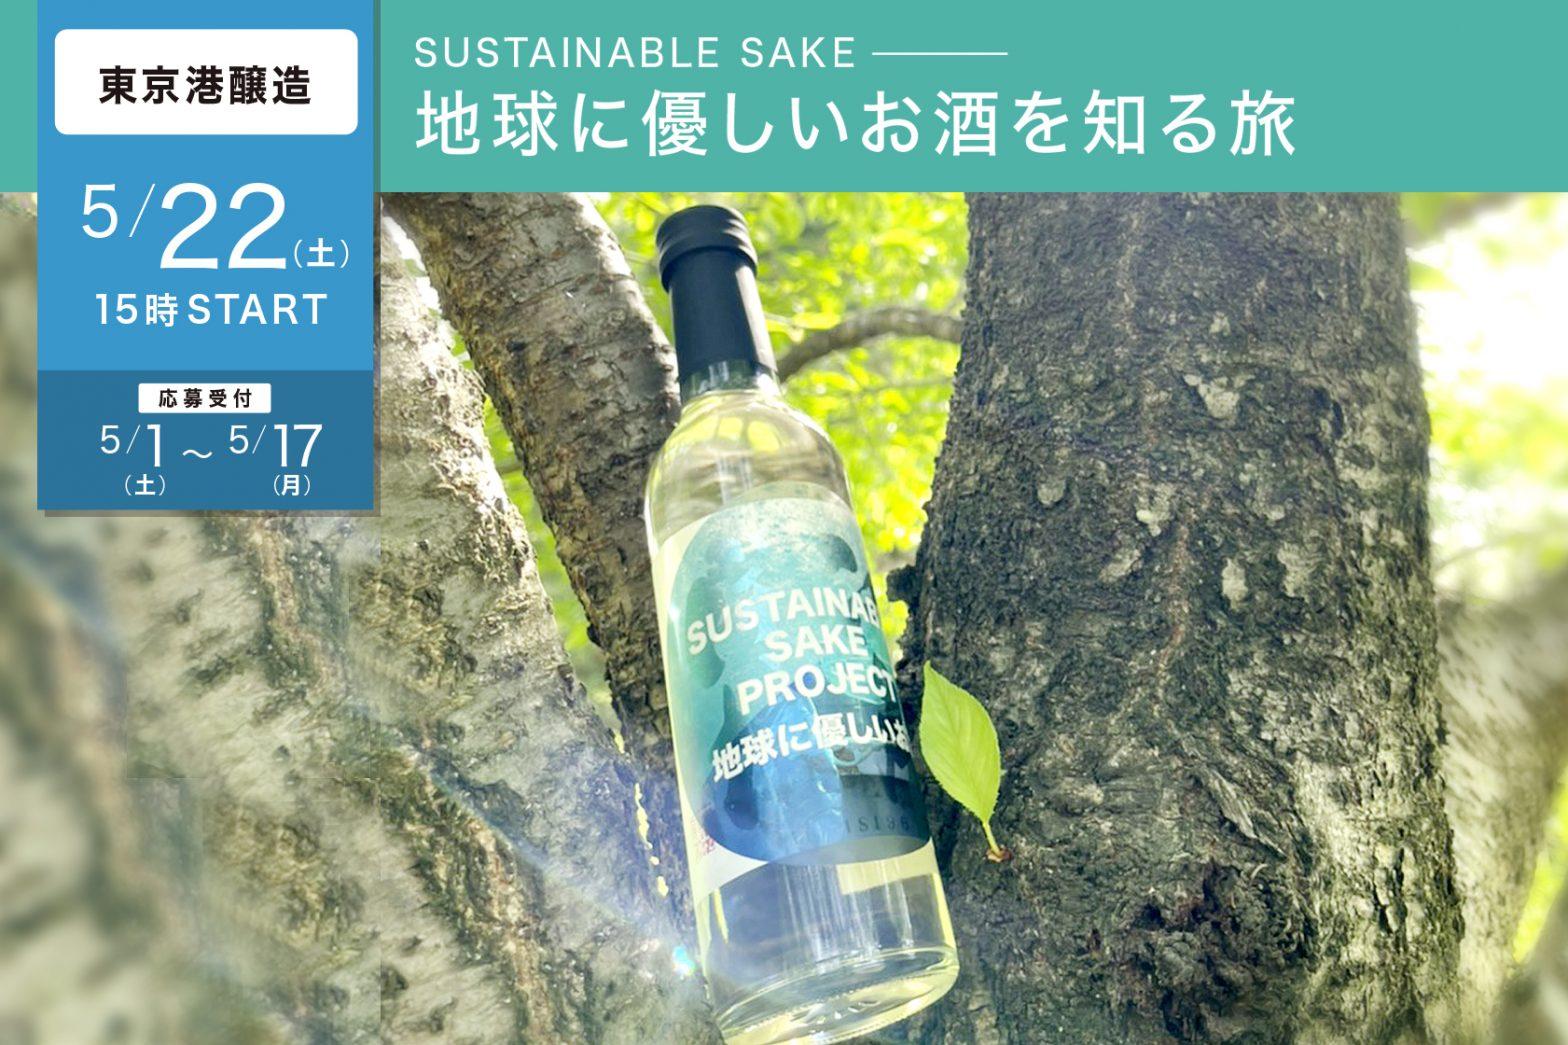 "5/22 ""SUSTAINABLE SAKE PROJECT""  地球に優しいお酒を知る旅"